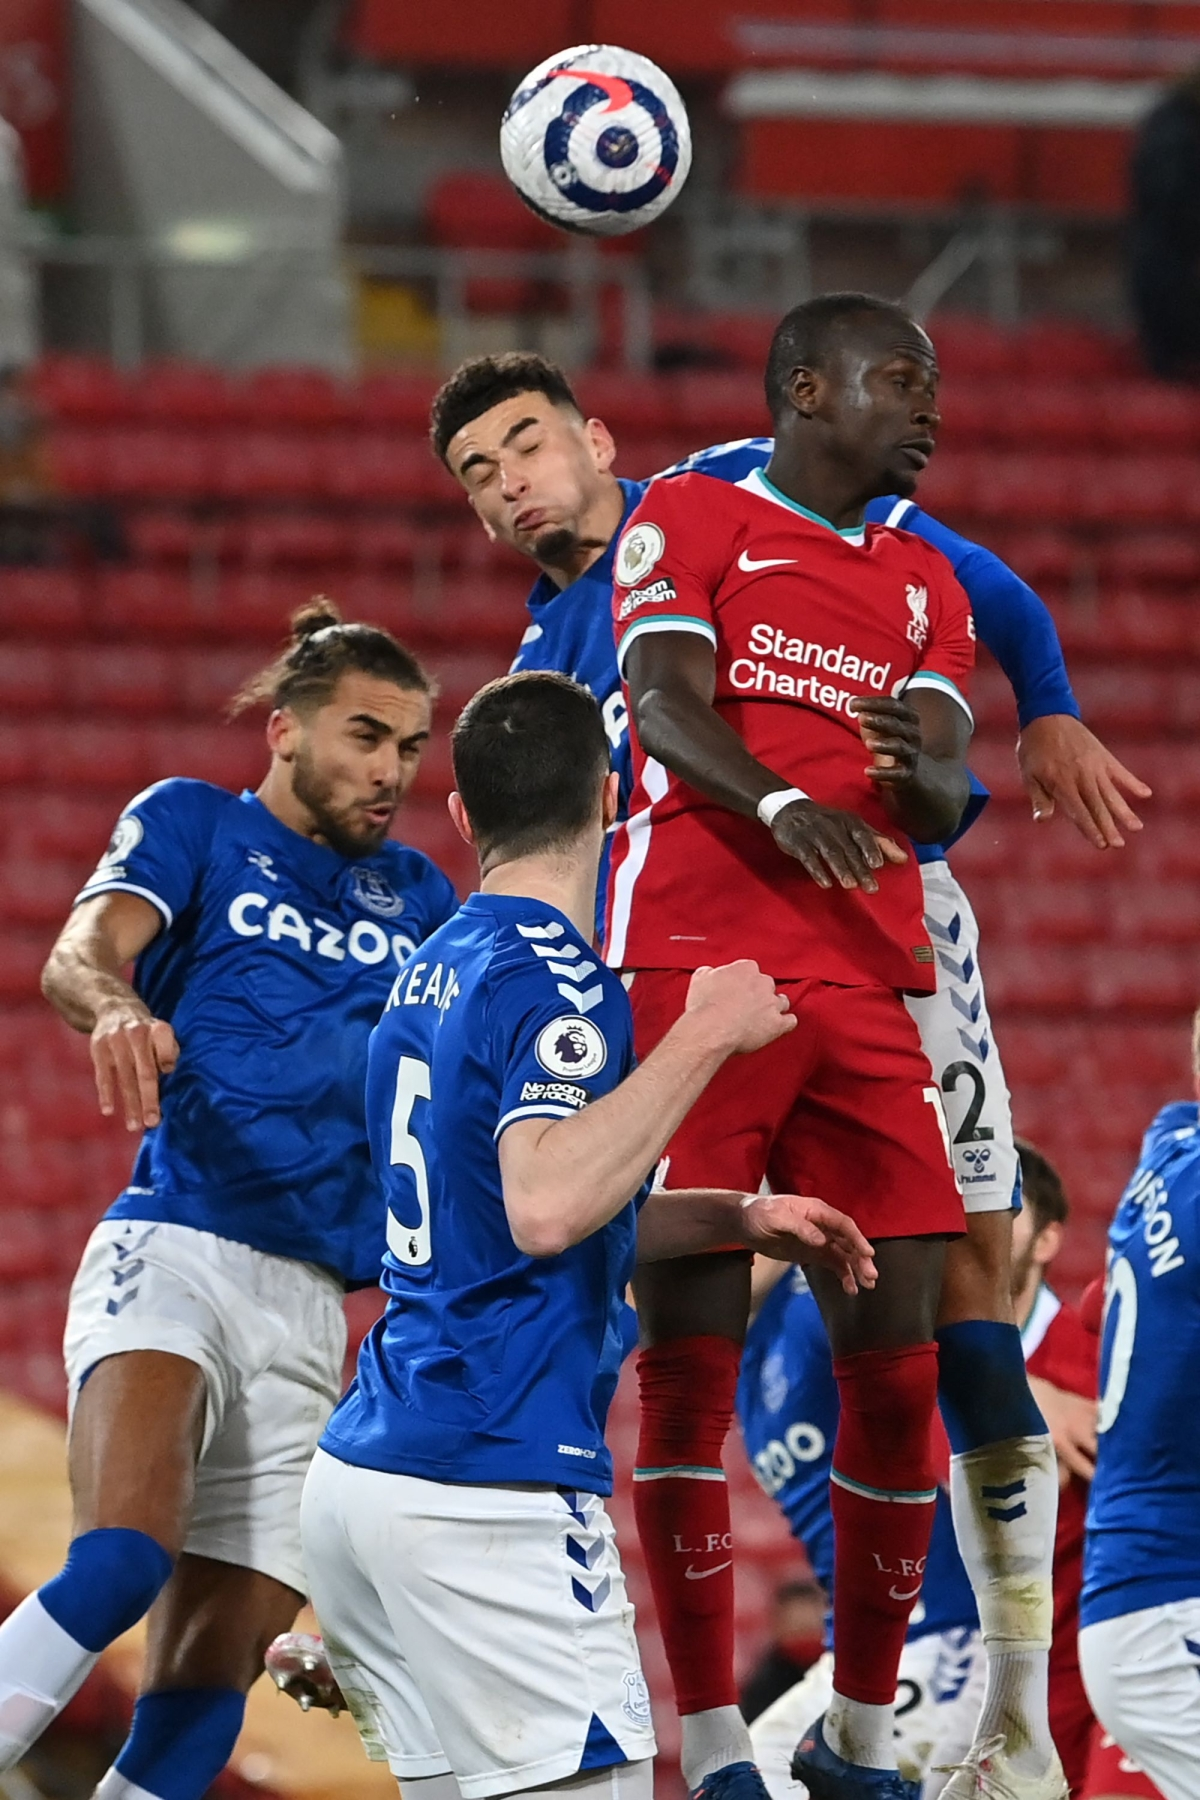 English Premier League: Everton win Merseyside derby; Beat Liverpool in their own backyard